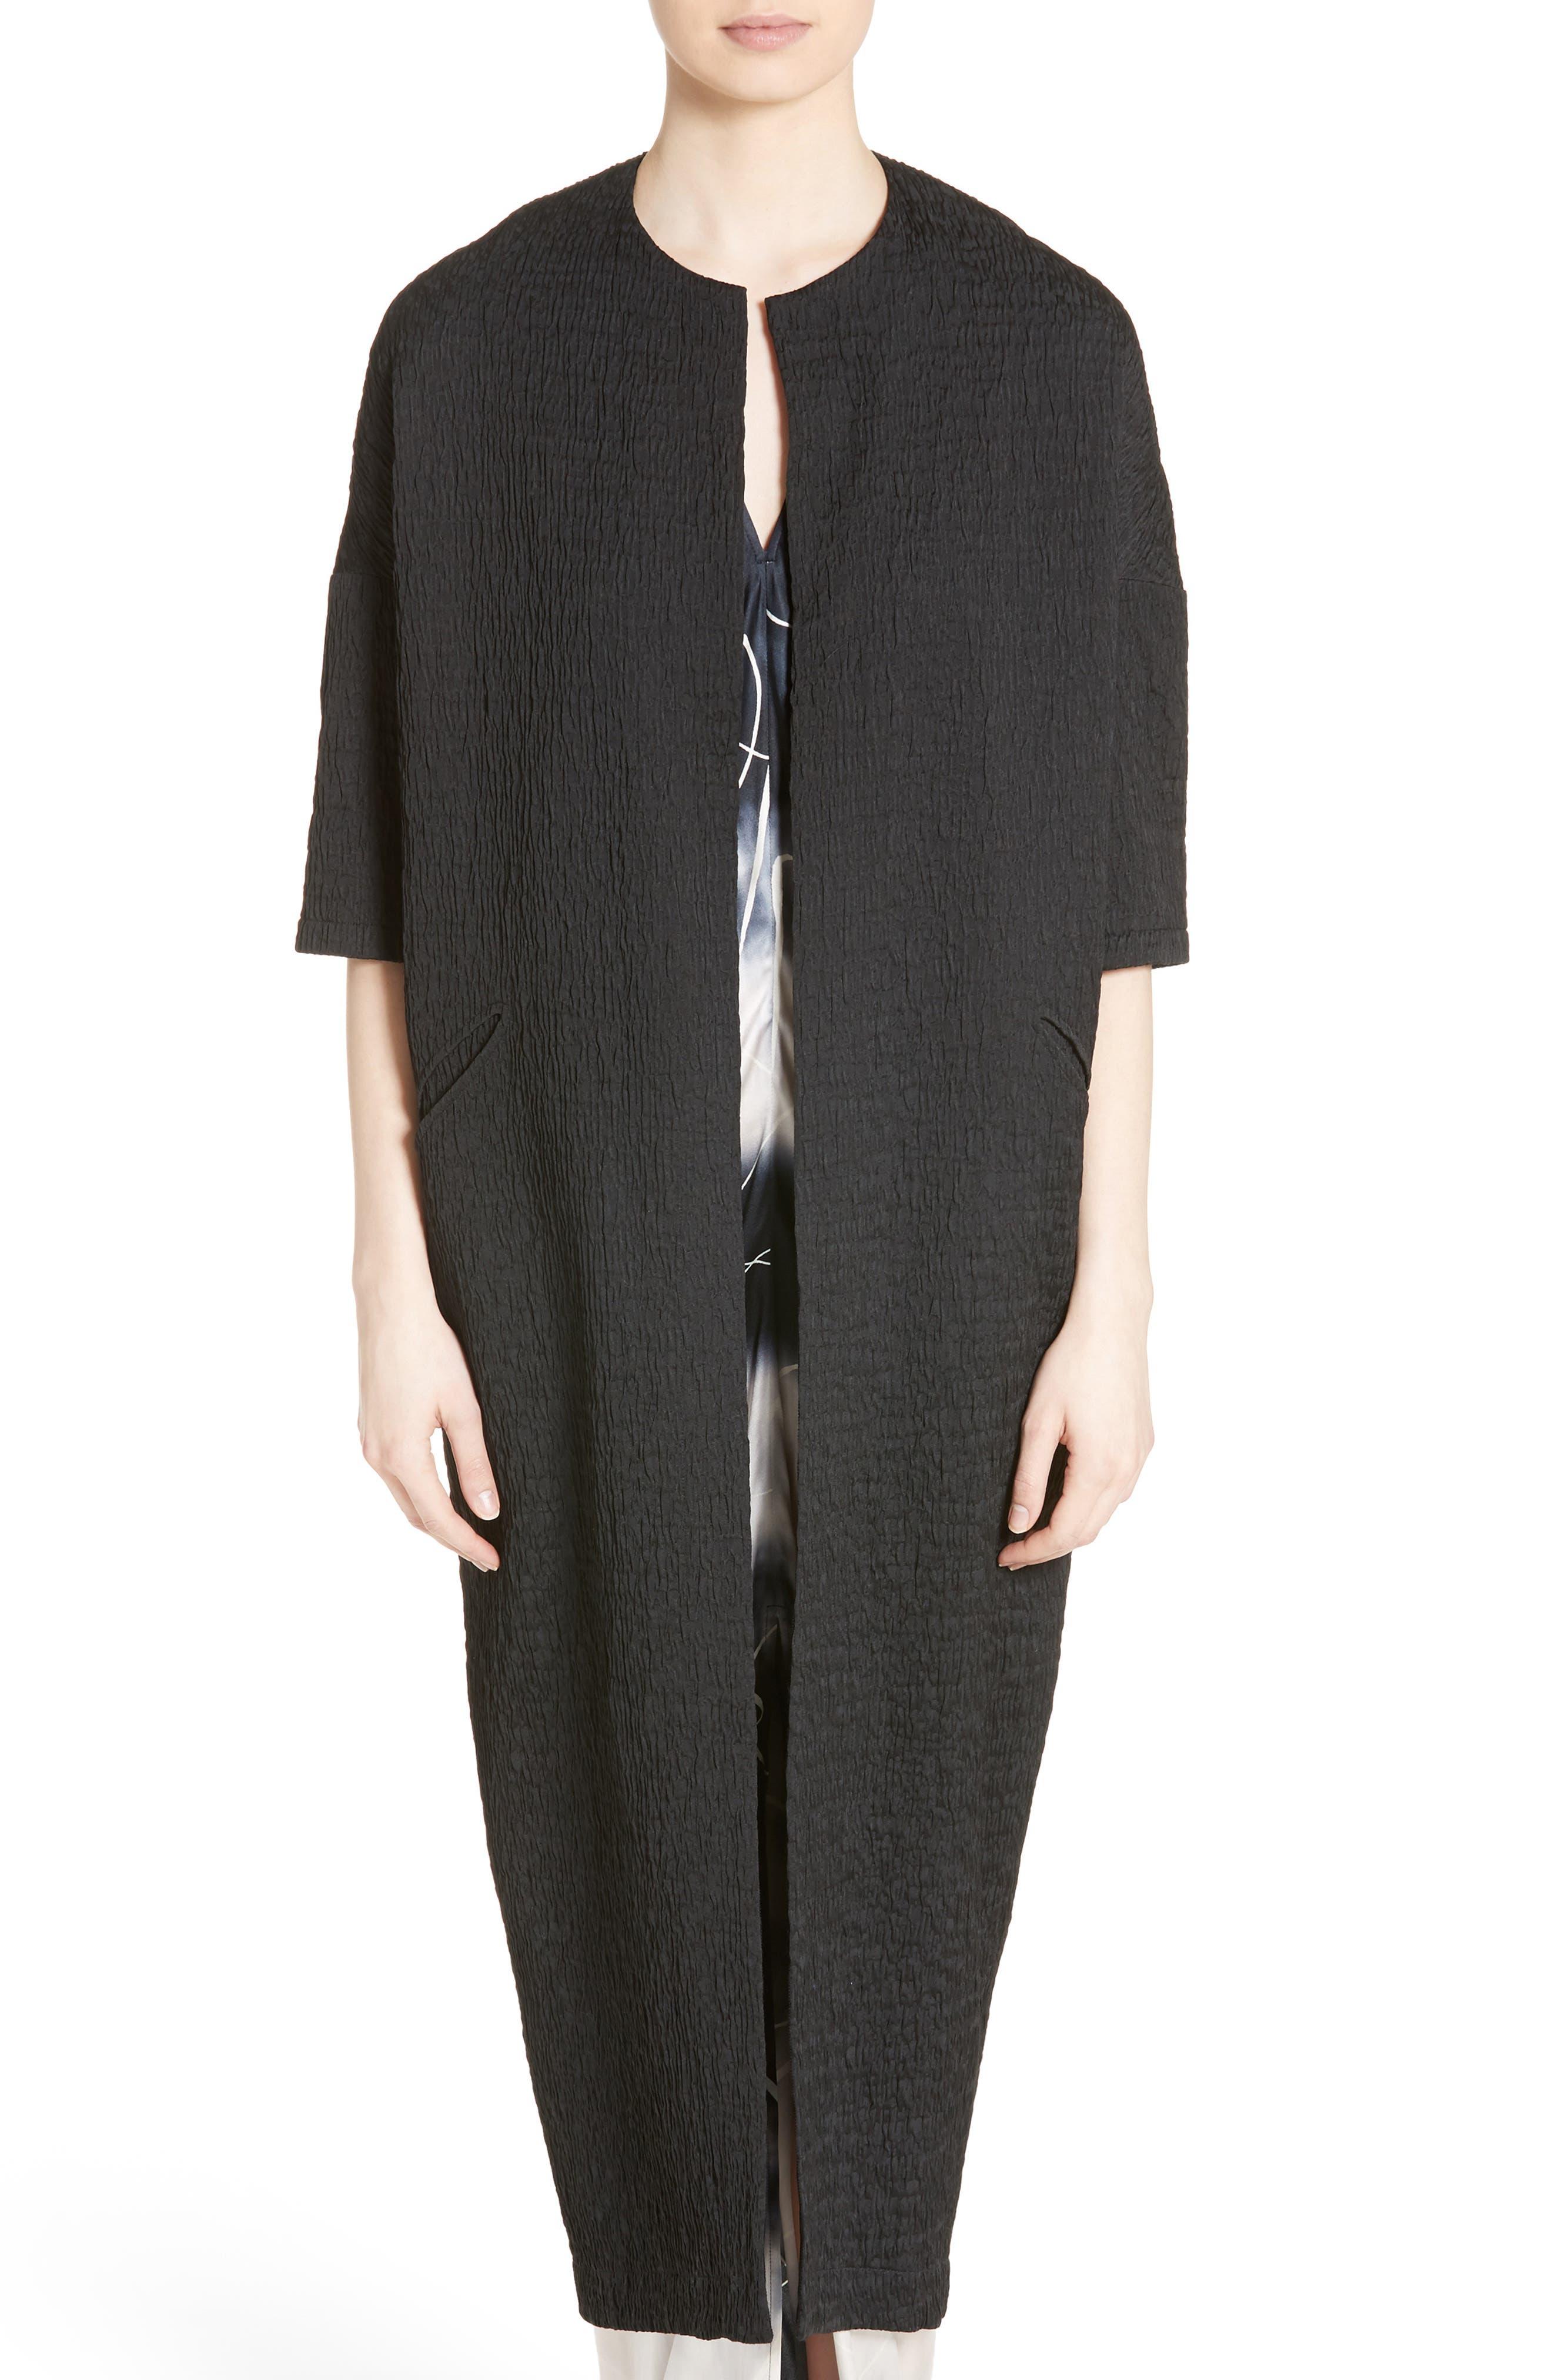 Zero + Maria Cornejo Koya Crinkle Stretch Coat